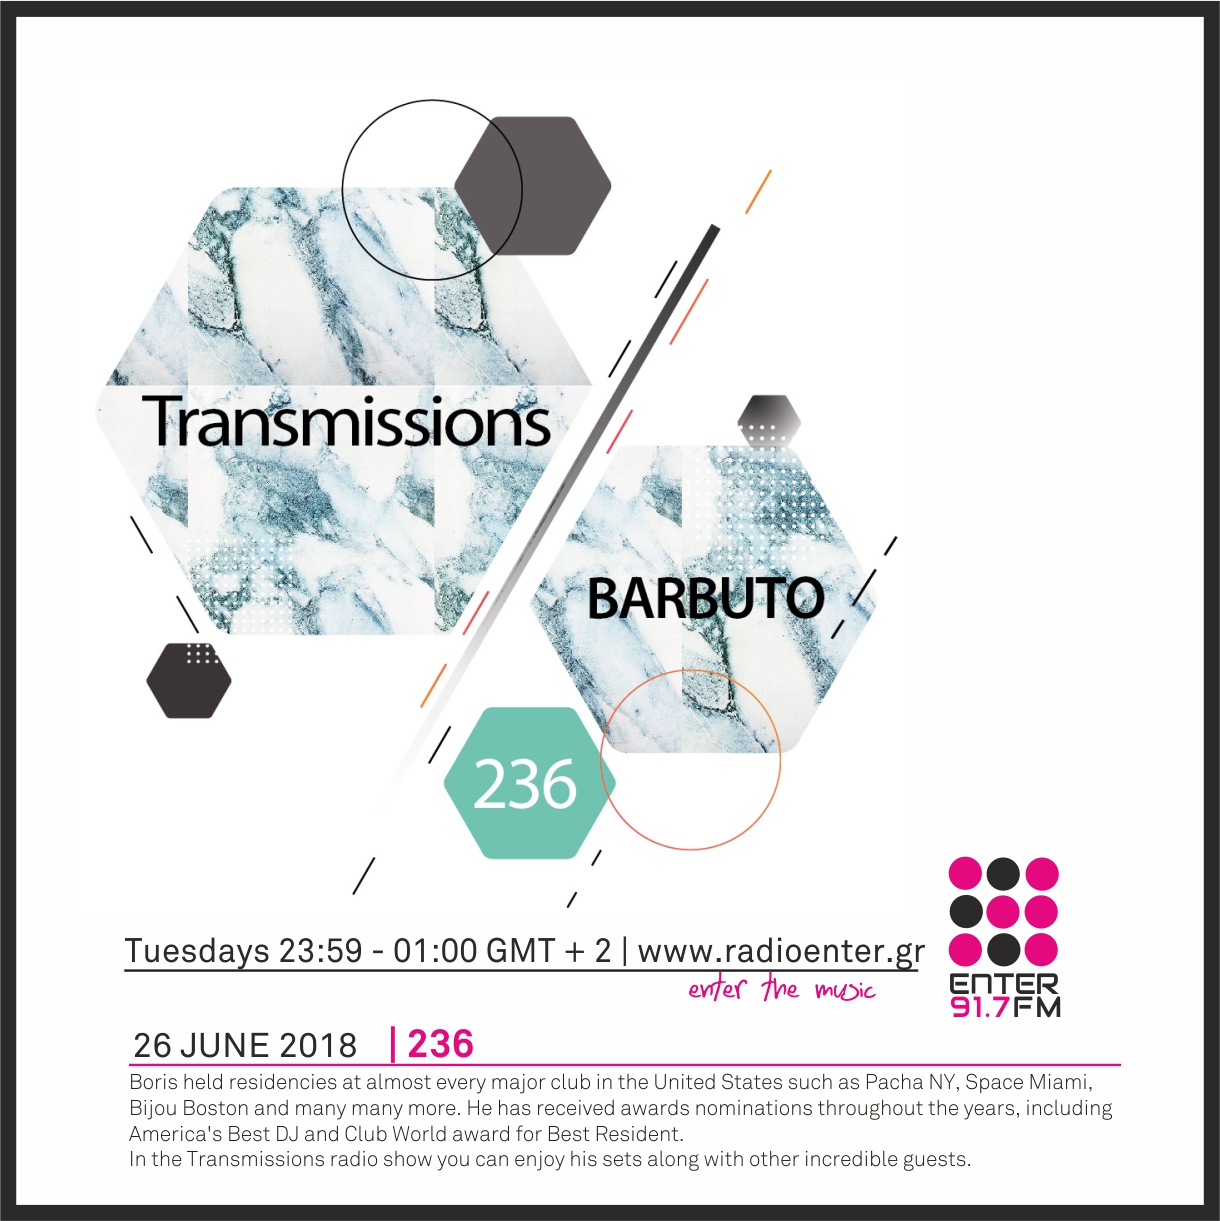 2018.06.26 - Boris Transmissions 236